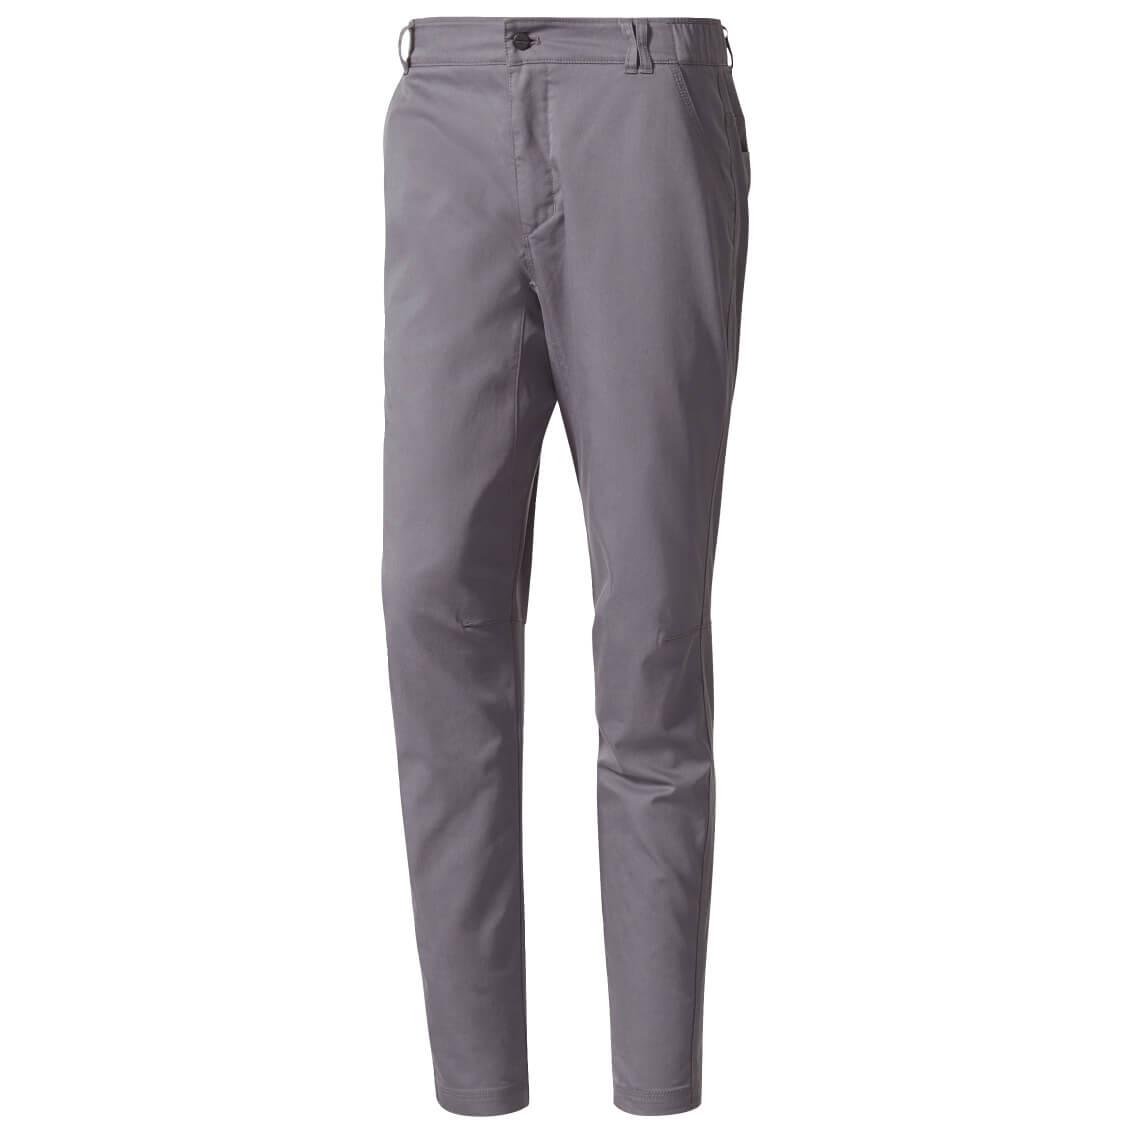 Adidas Terrex Climb The City Pants Climbing trousers Men's